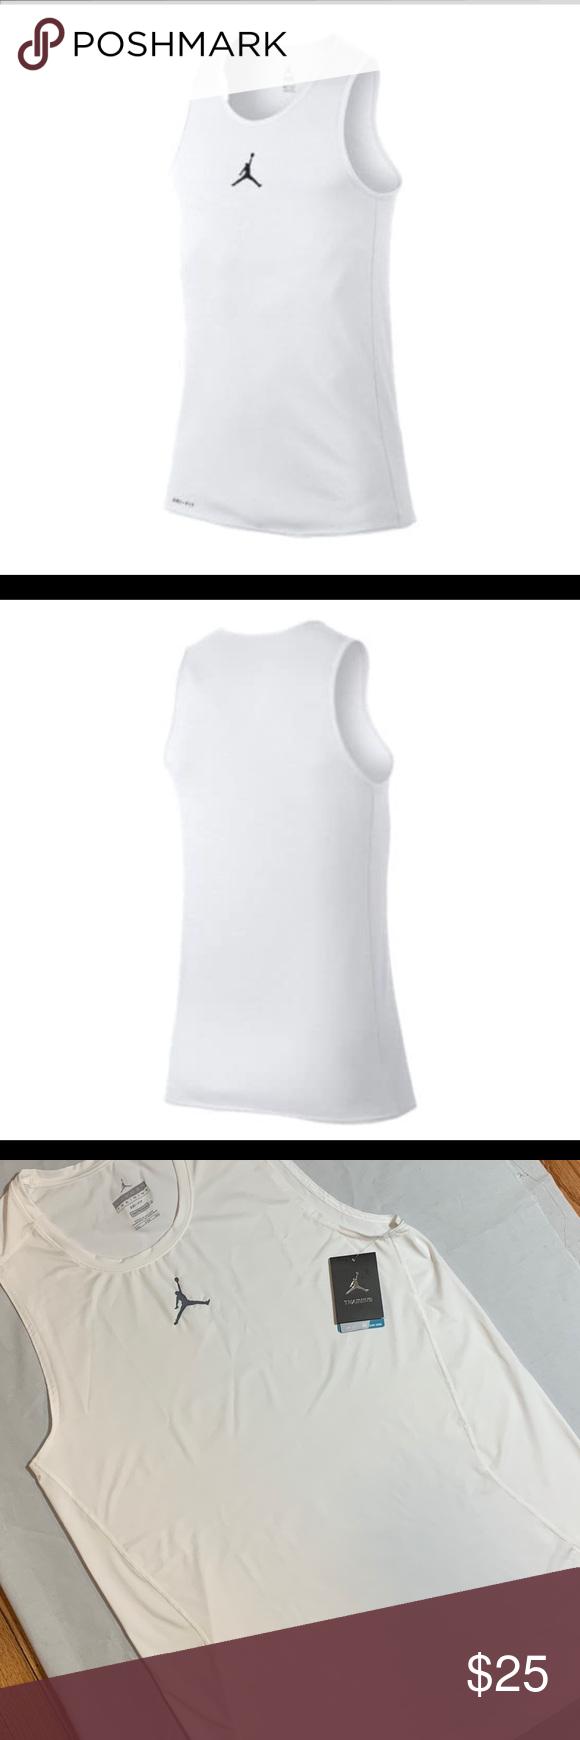 f5644d44ea6ddf Mens Jordan Rise Dry Fit tank top shirt 4XL This 🆕 white Jordan tank is